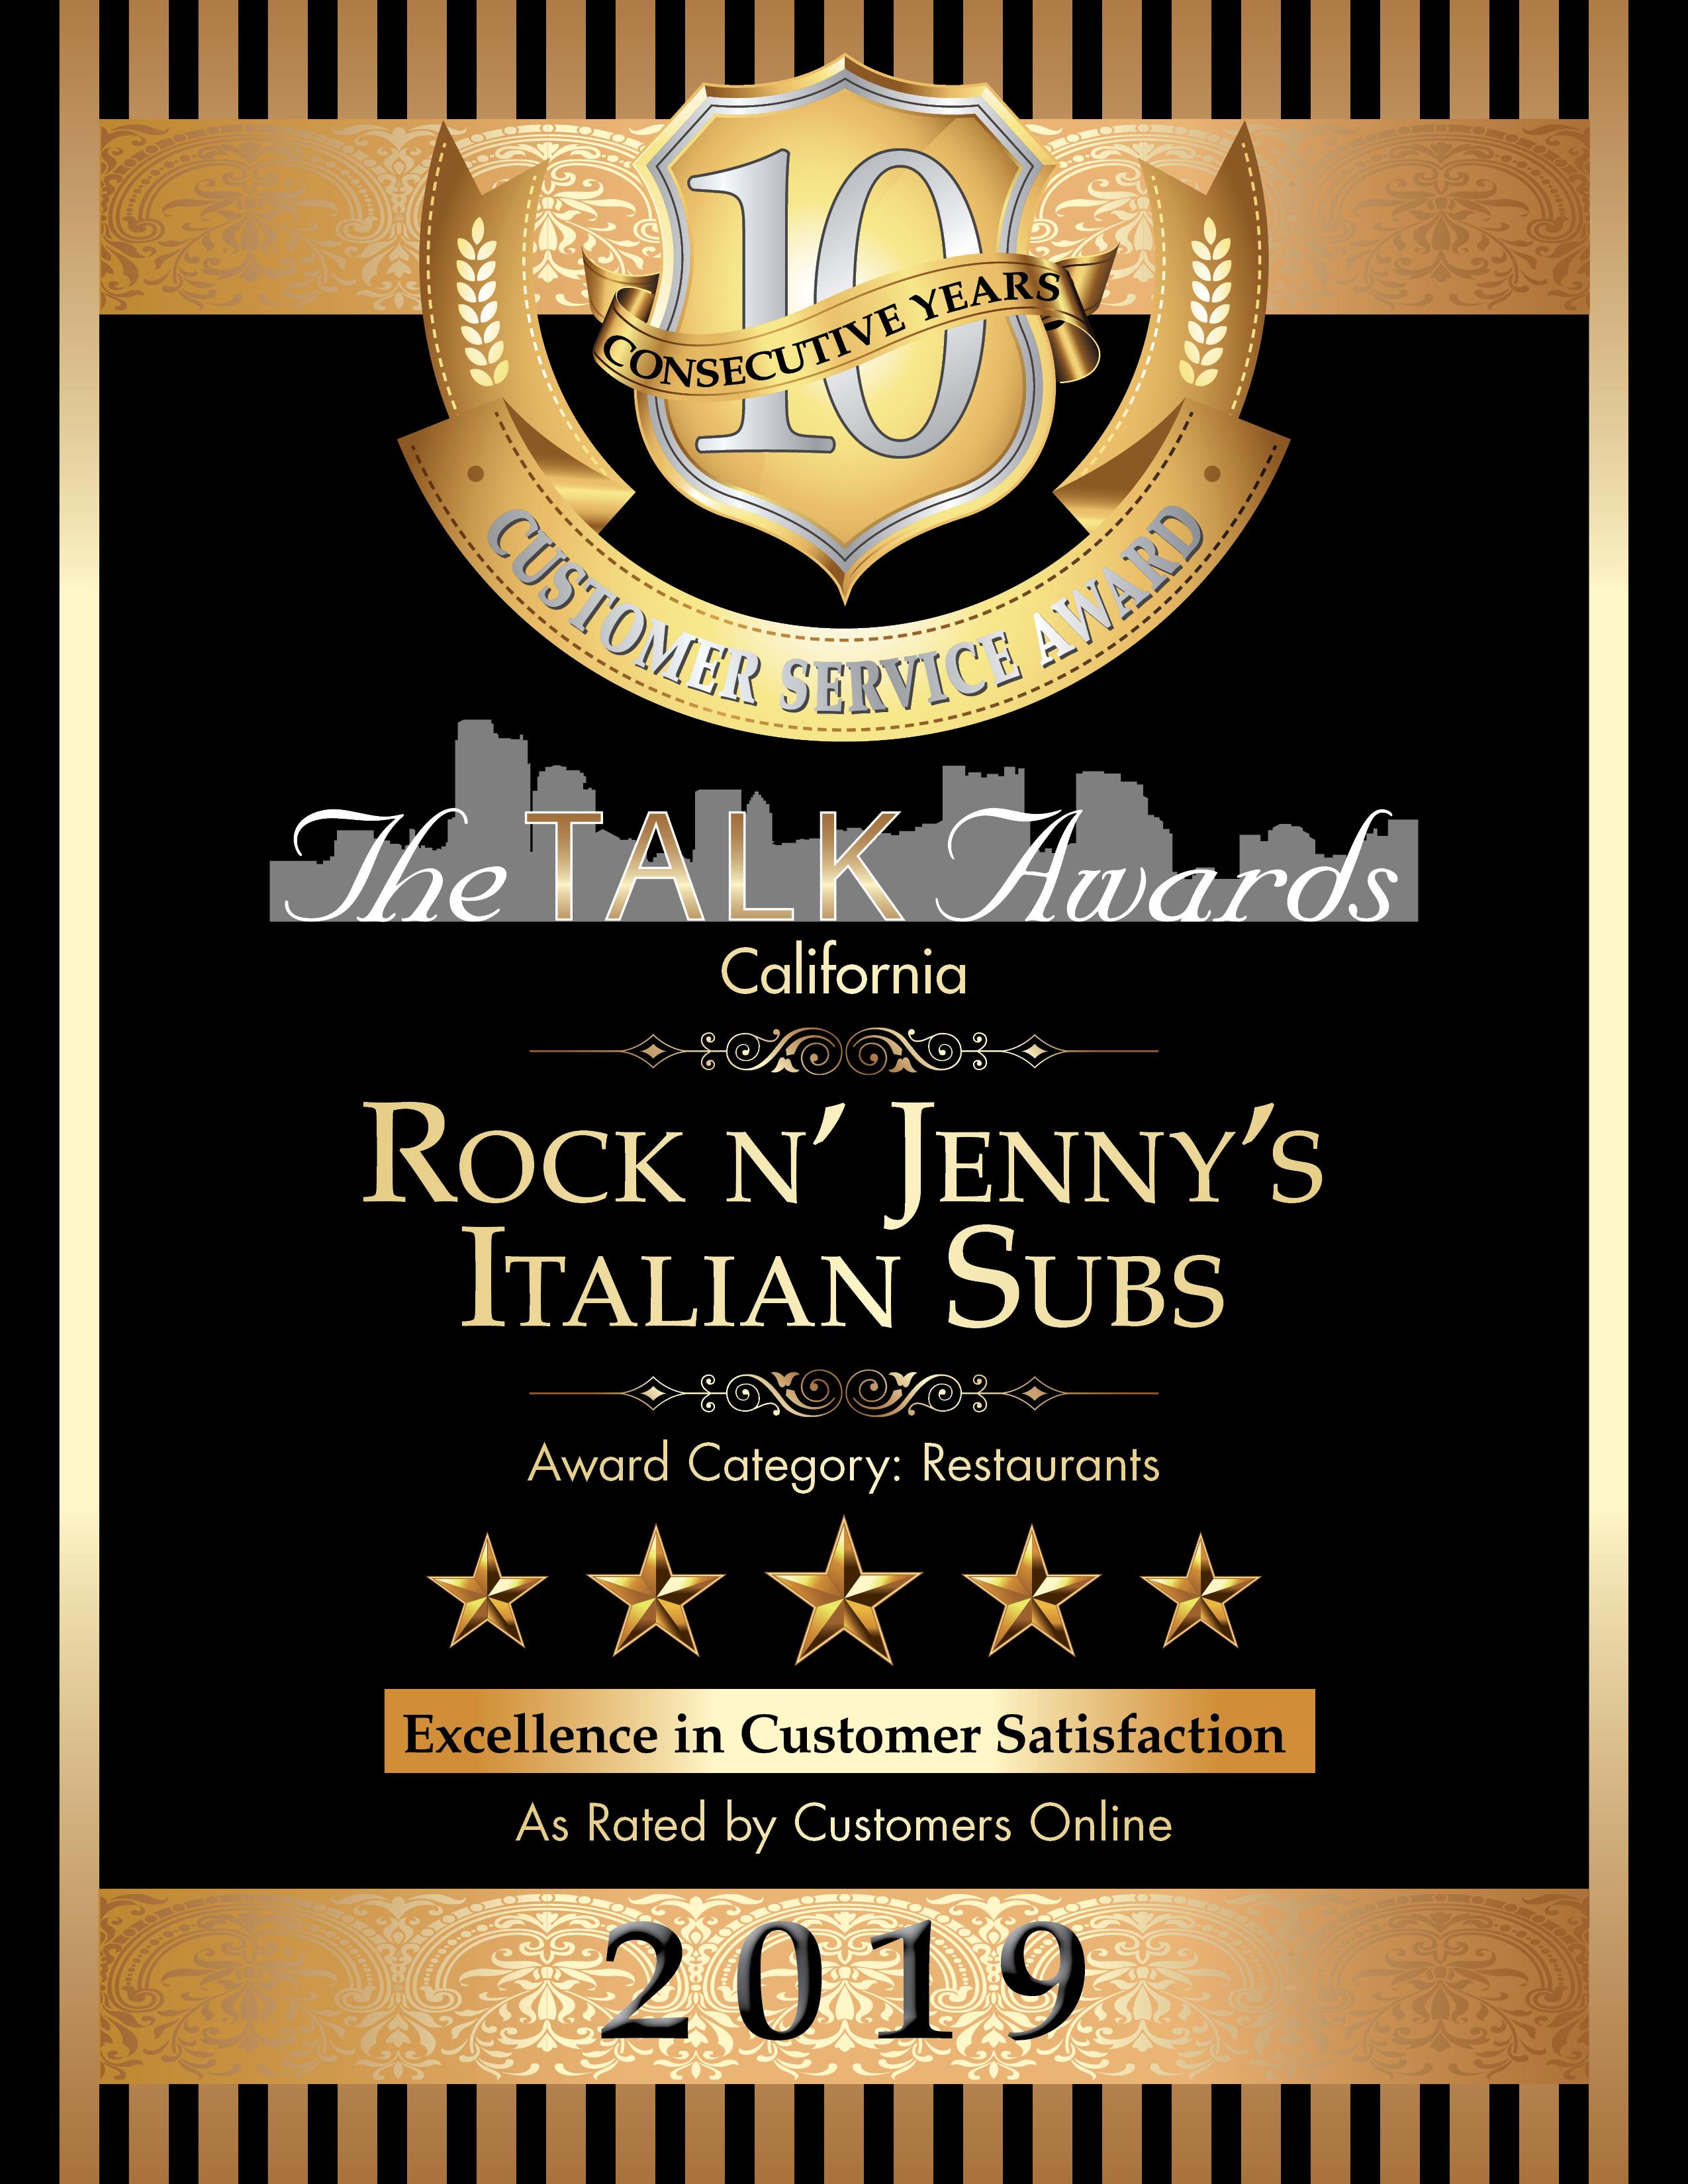 Talk Awards 2019 Winner, Rock N Jenny's